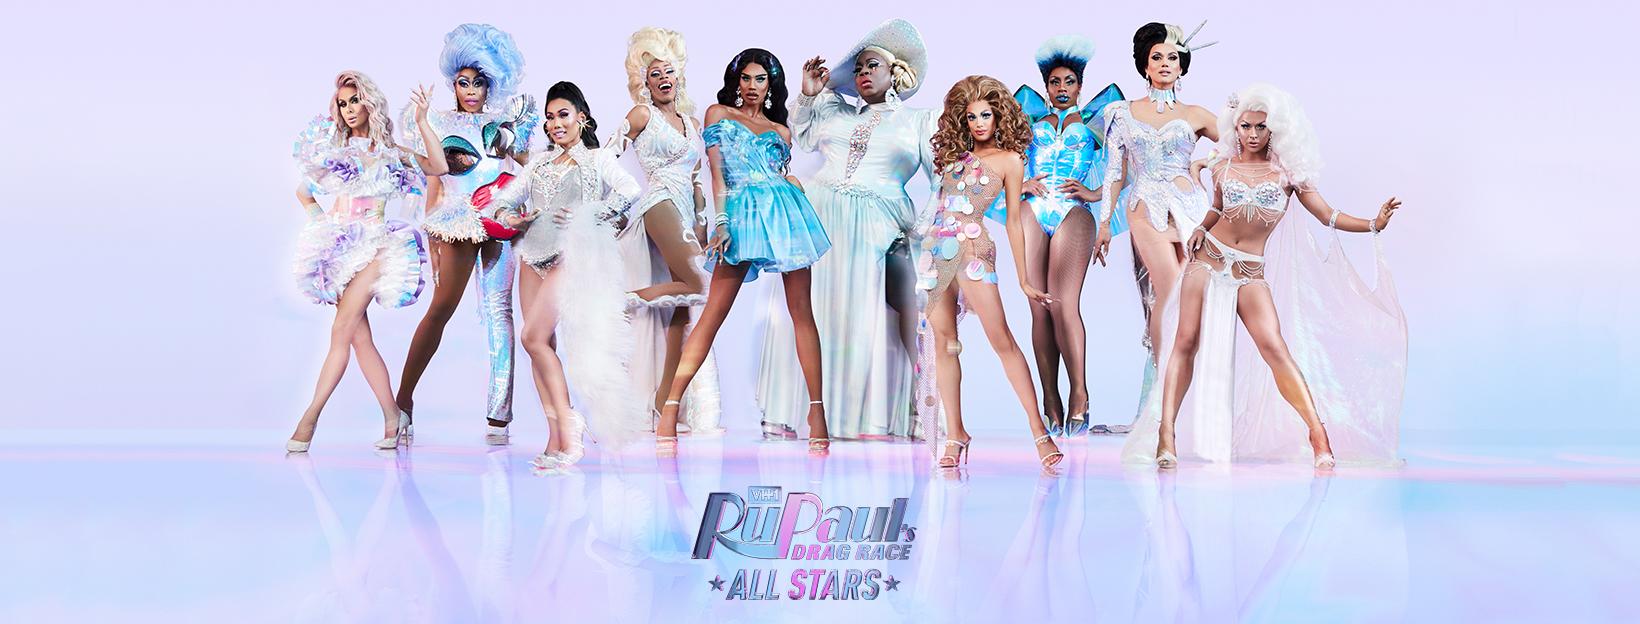 VH1 RUPAUL'S DRAG RACE ALLSTARS